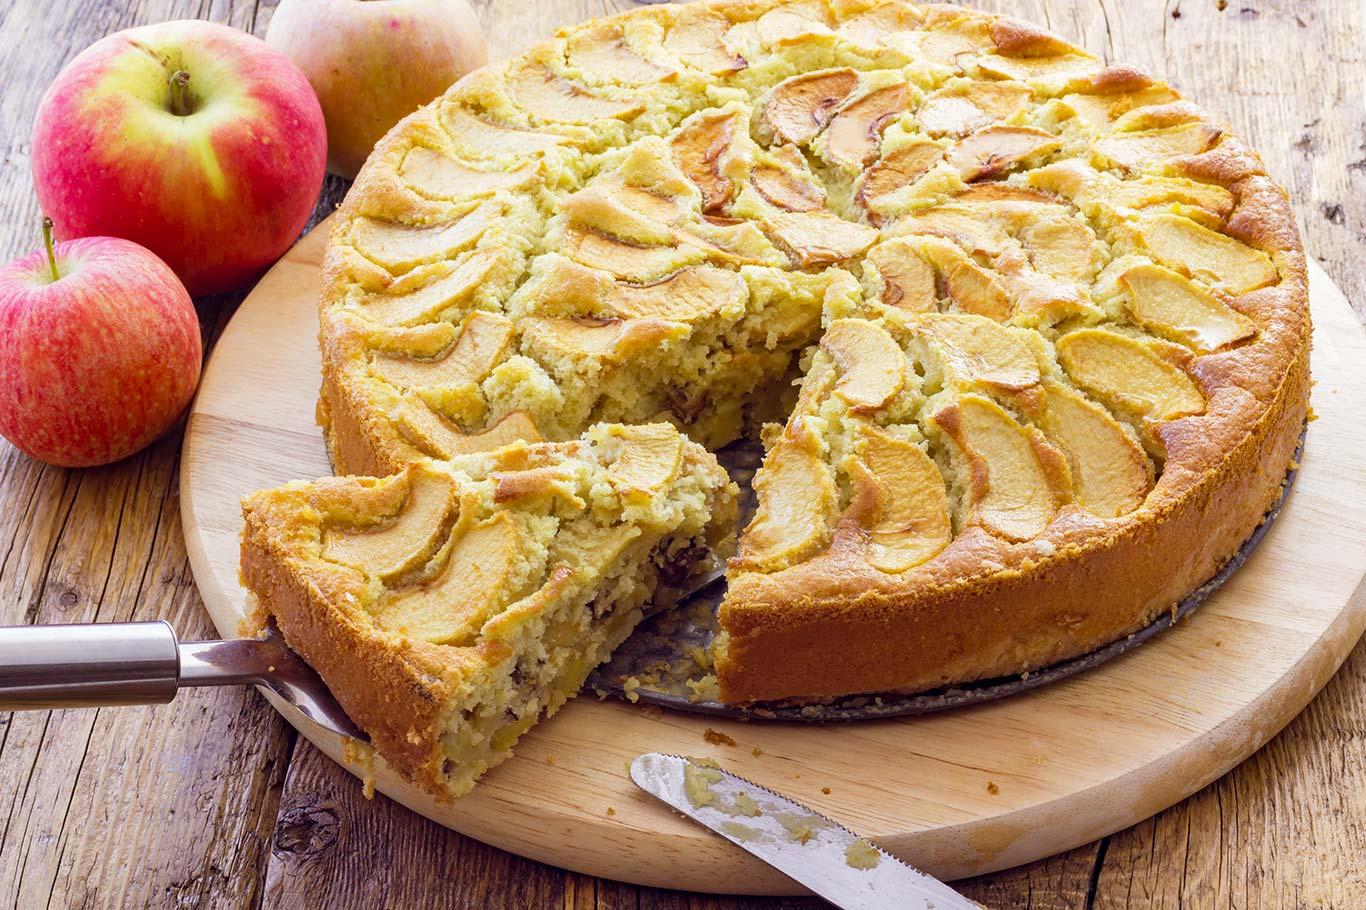 Receta de tarta de manzana al microondas